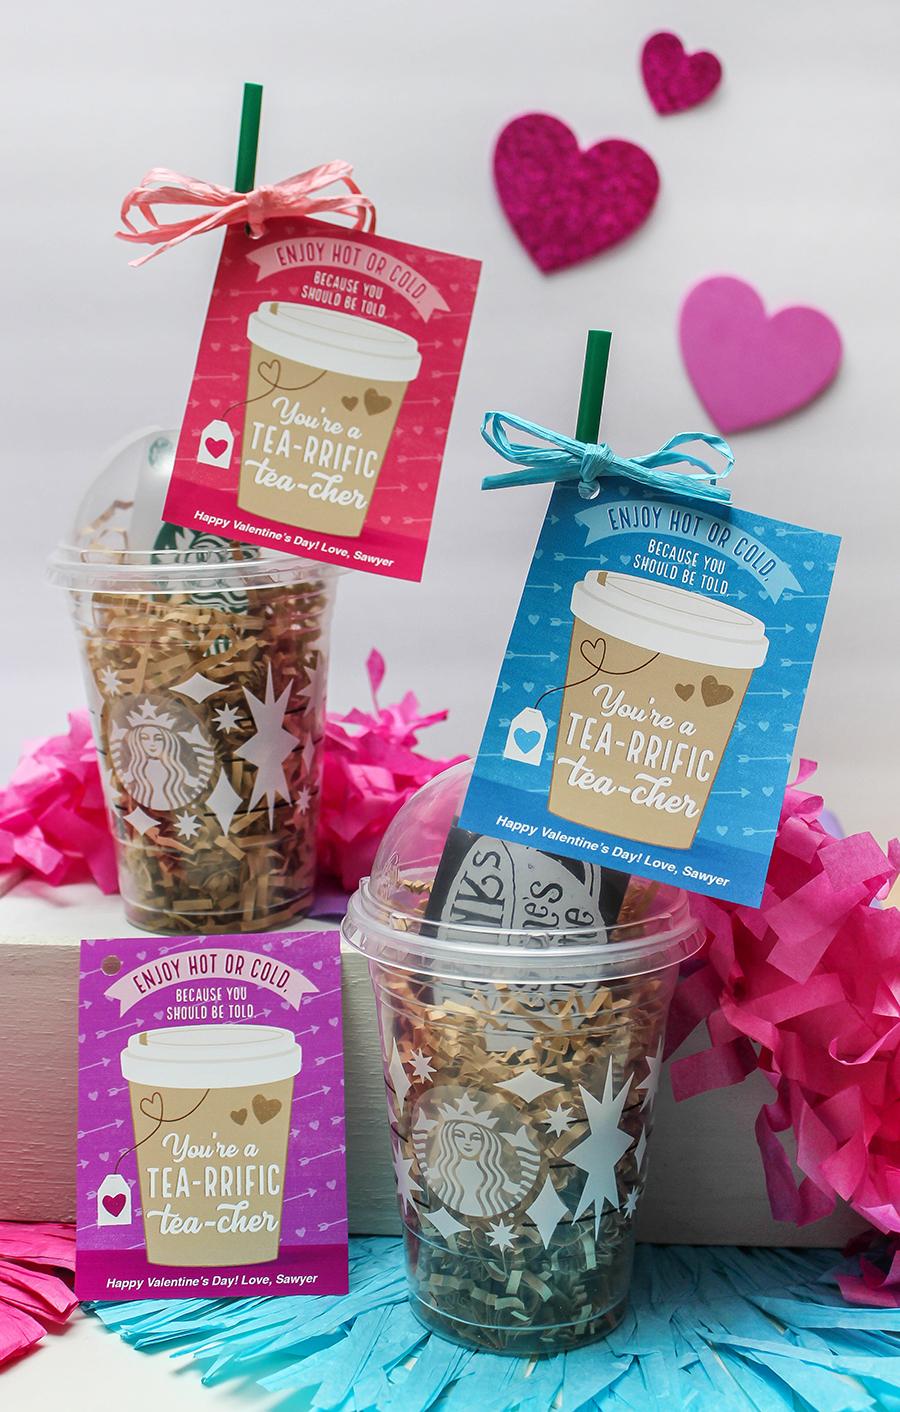 Valentine's Day gift ideas for teachers, teacher gifts, teacher appreciation, gift tags, printable gift tags, valentines, school valentines, Just Add Confetti, etsy shop, tea, you're a tea-rrific tea-cher, tea gift tag